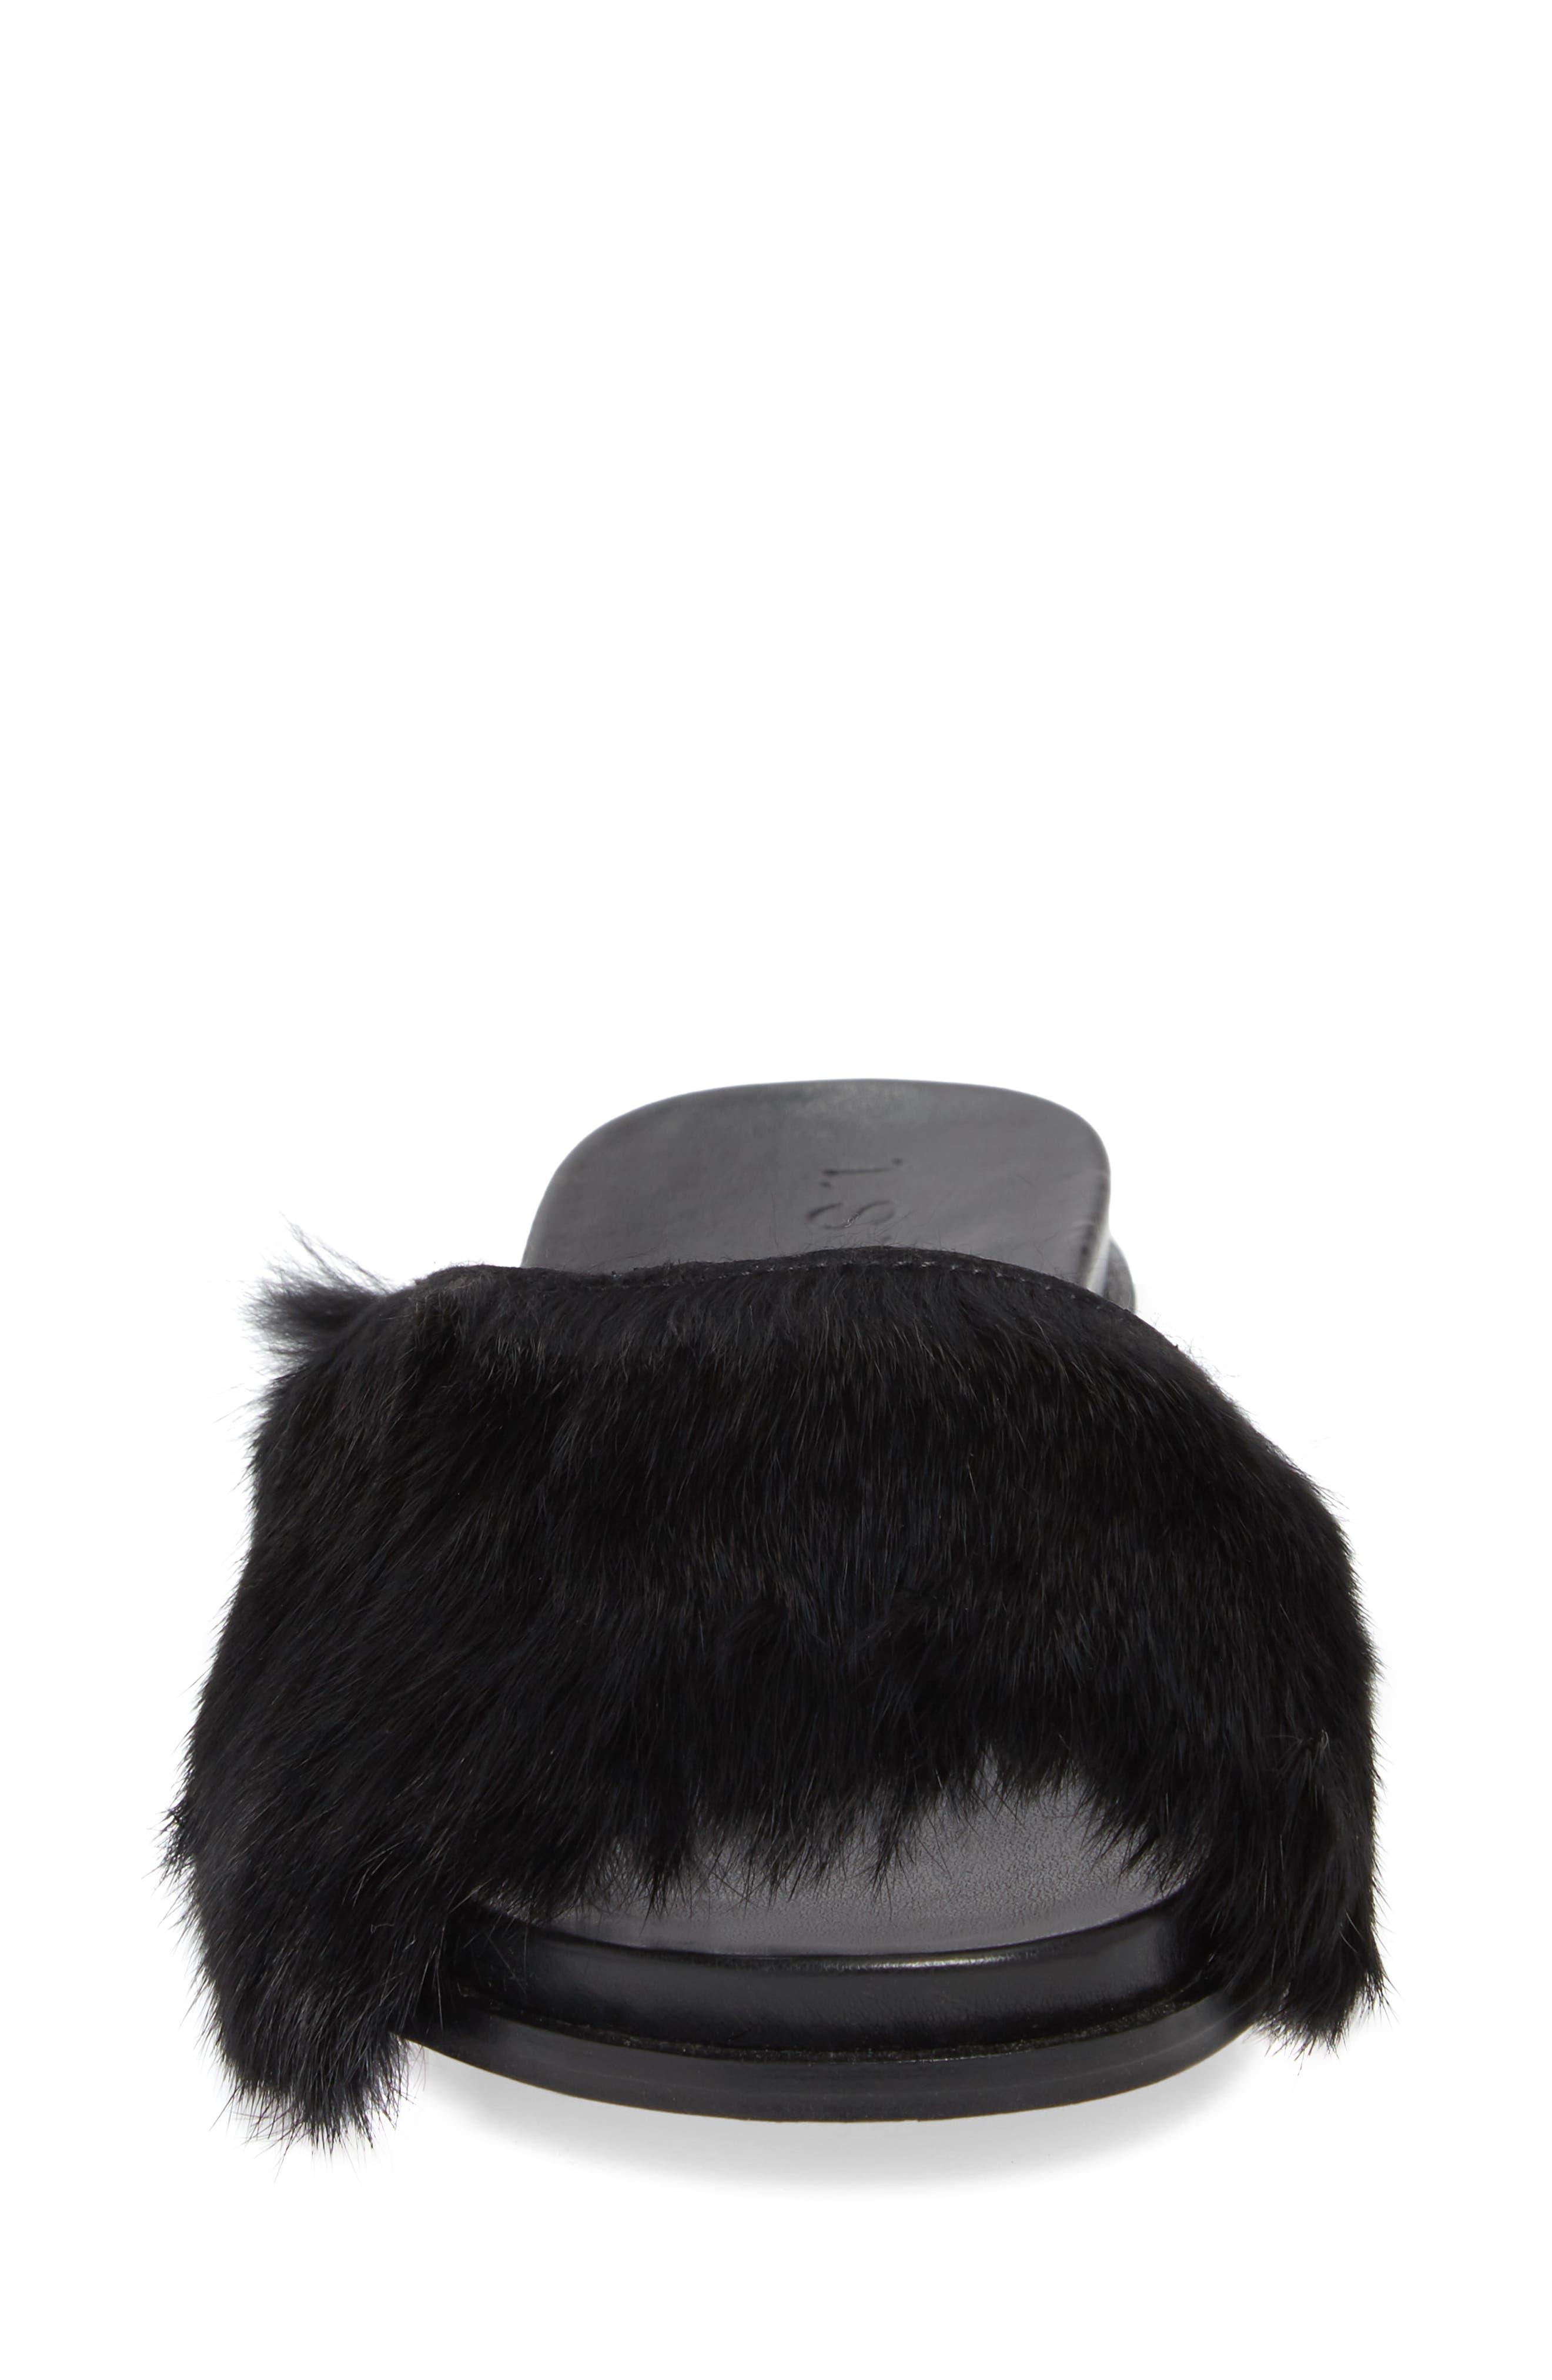 Onora Genuine Rabbit Fur Slide Sandal,                             Alternate thumbnail 4, color,                             Black Rabbit Fur